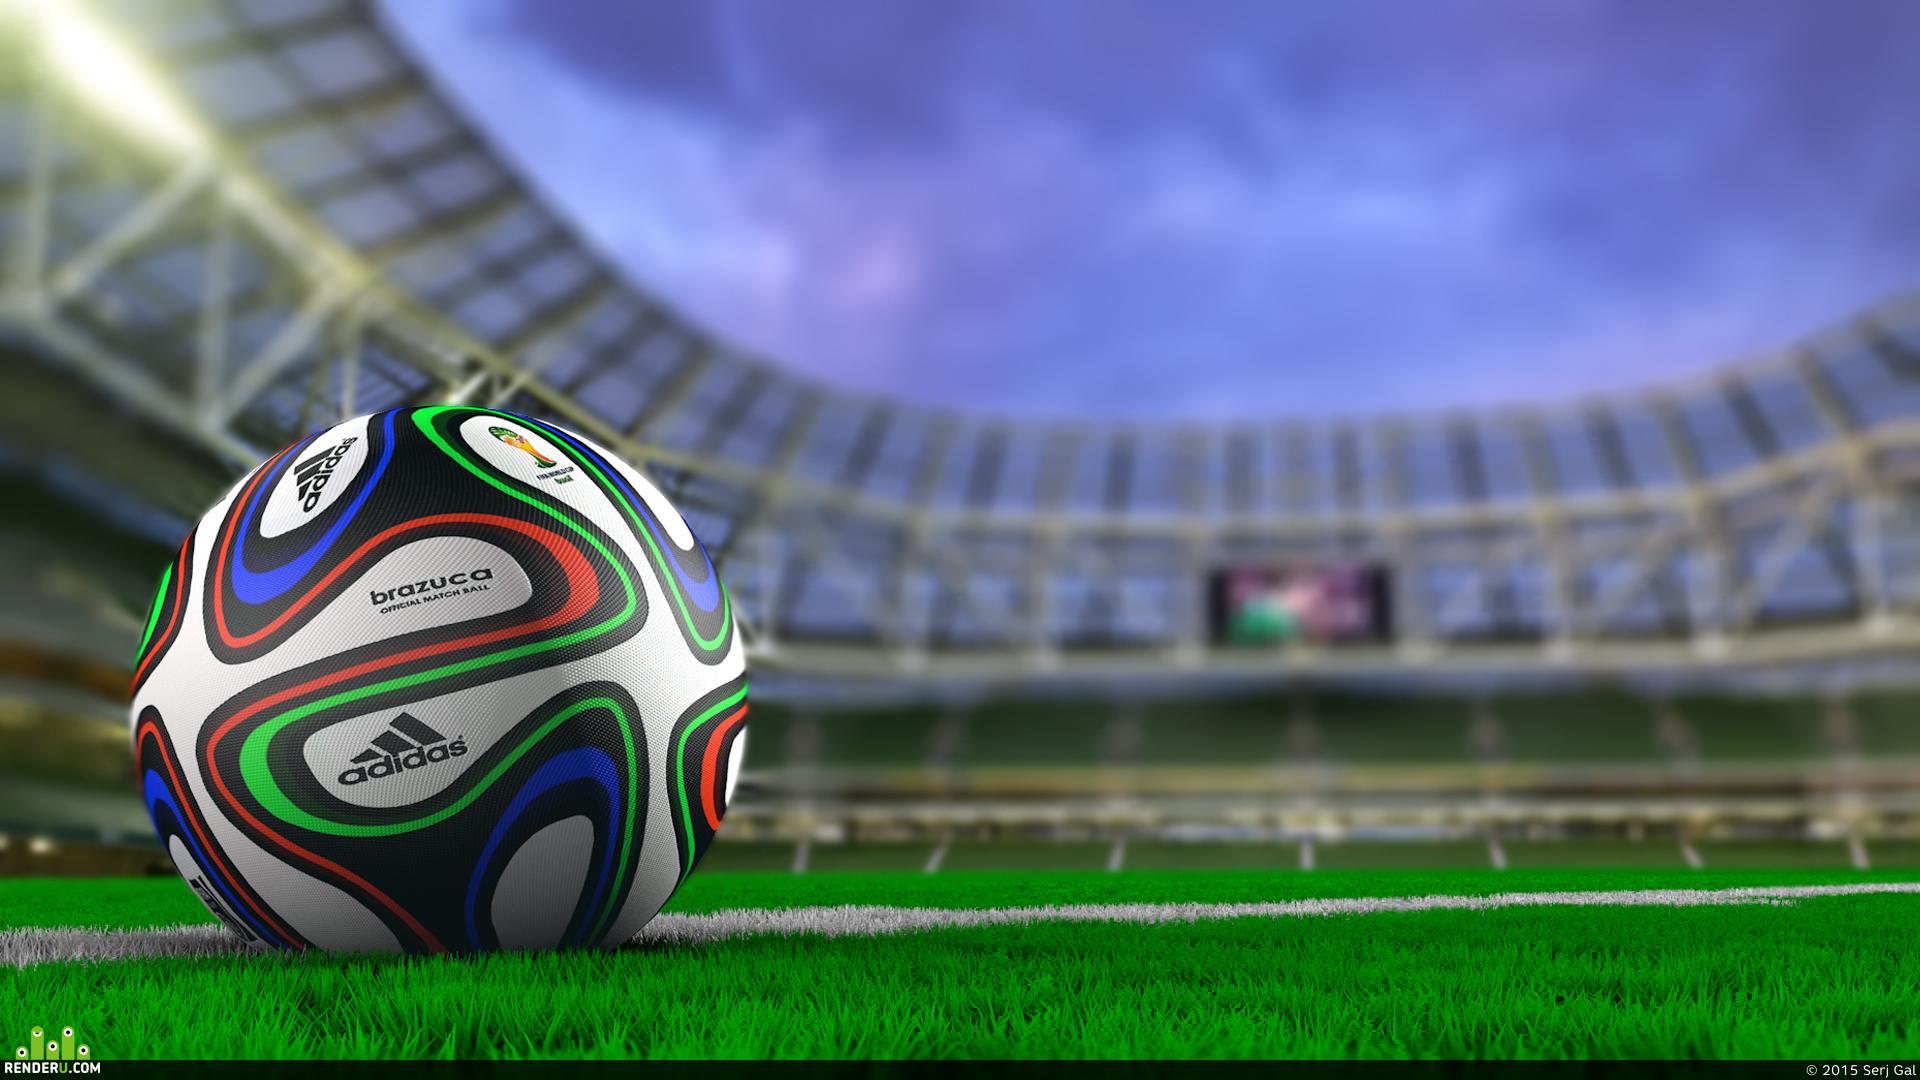 preview Футбольный мяч